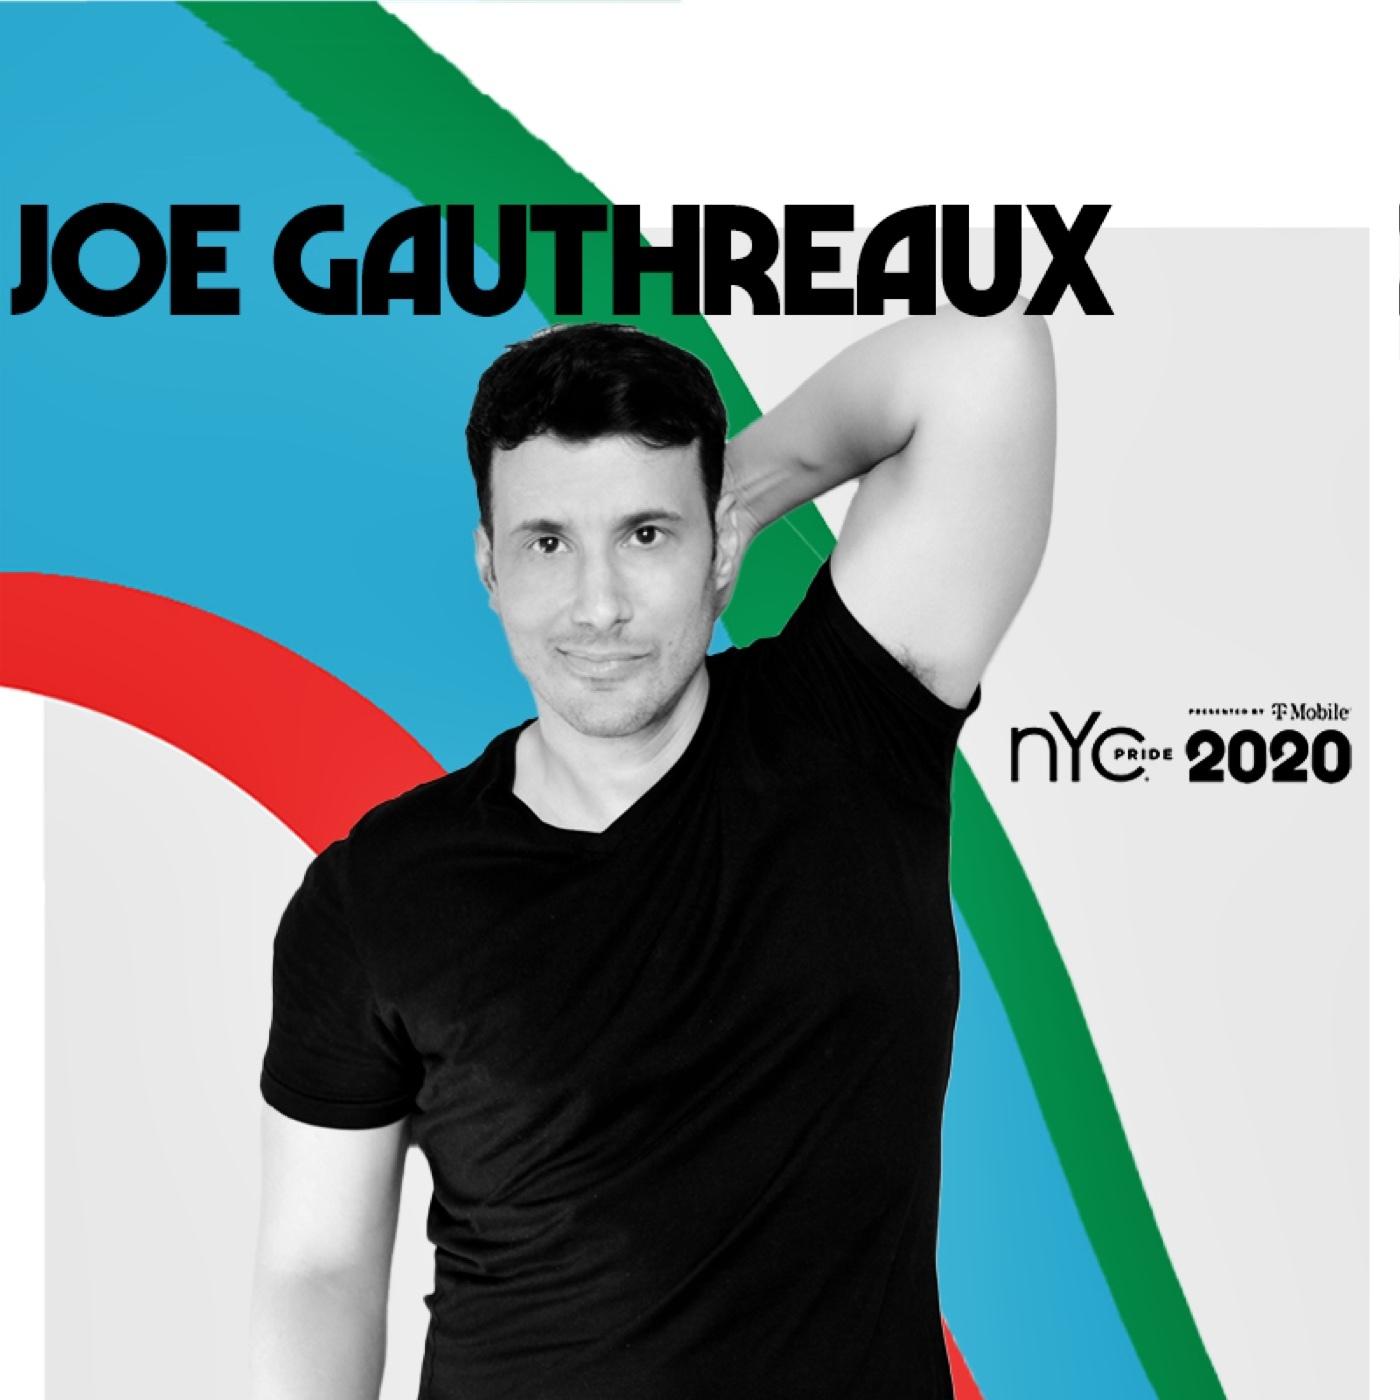 NYC PRIDE 2020 Live Stream . Joe Gauthreaux's Podcast